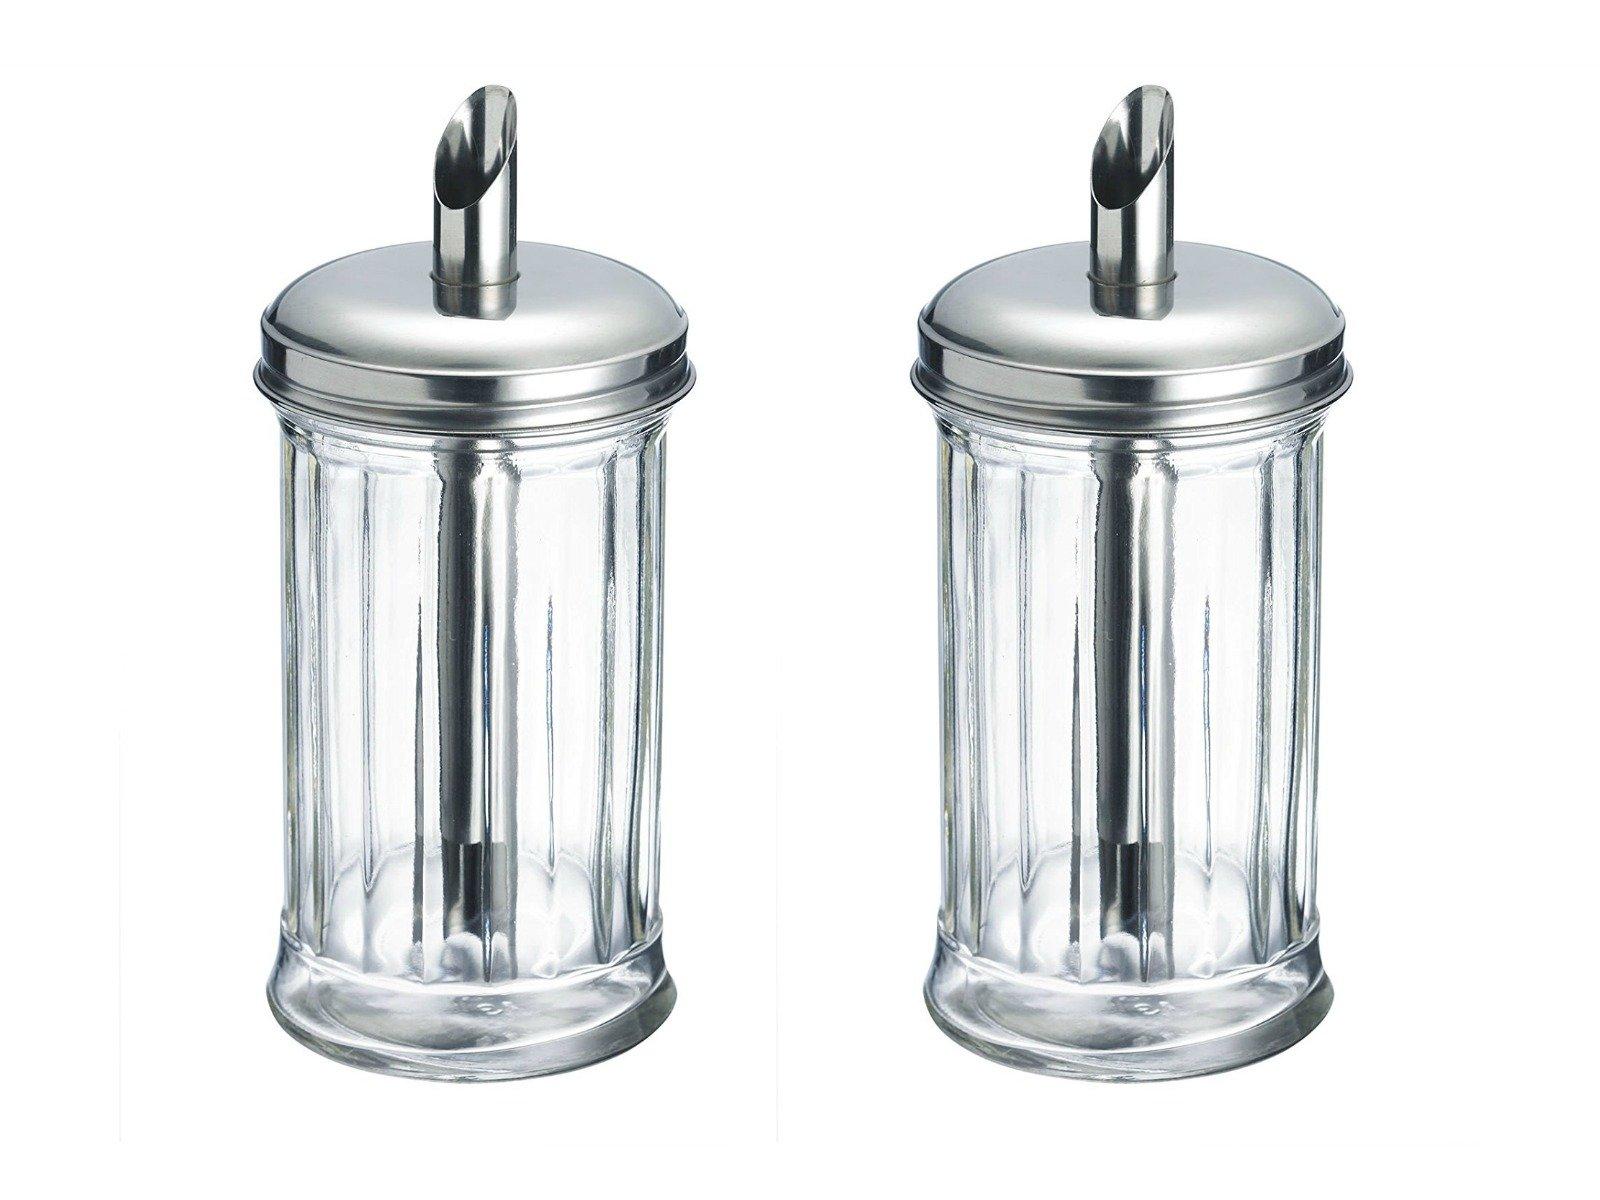 Westmark Germany 'New York' Glass Sugar Dispenser, Stainless Steel 2 Pack